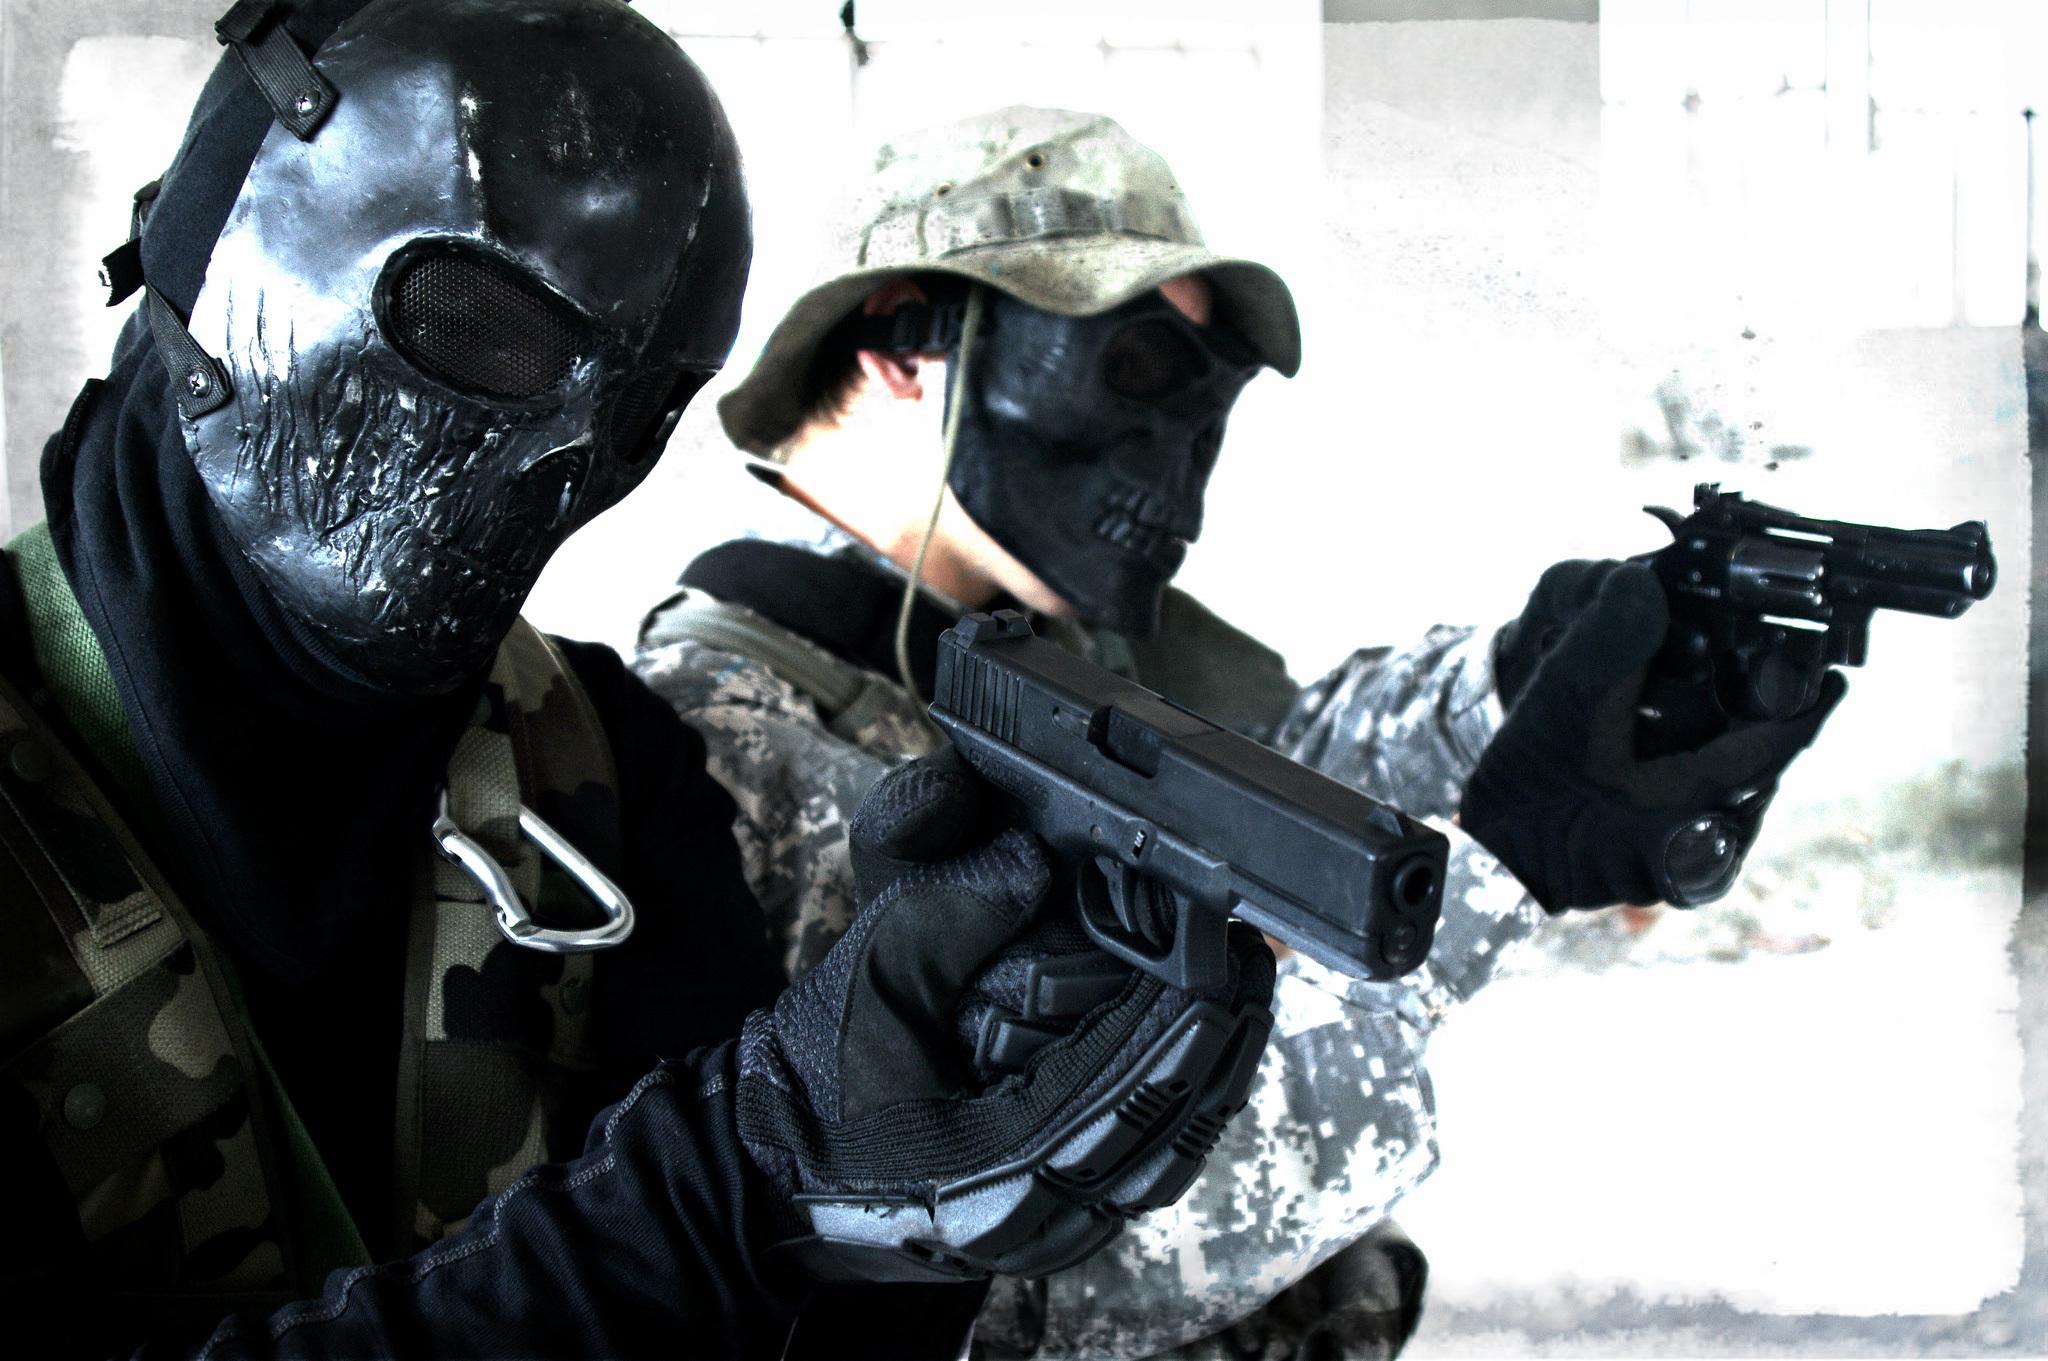 спецназ в крутых масках фото телешоу пацанки попадают